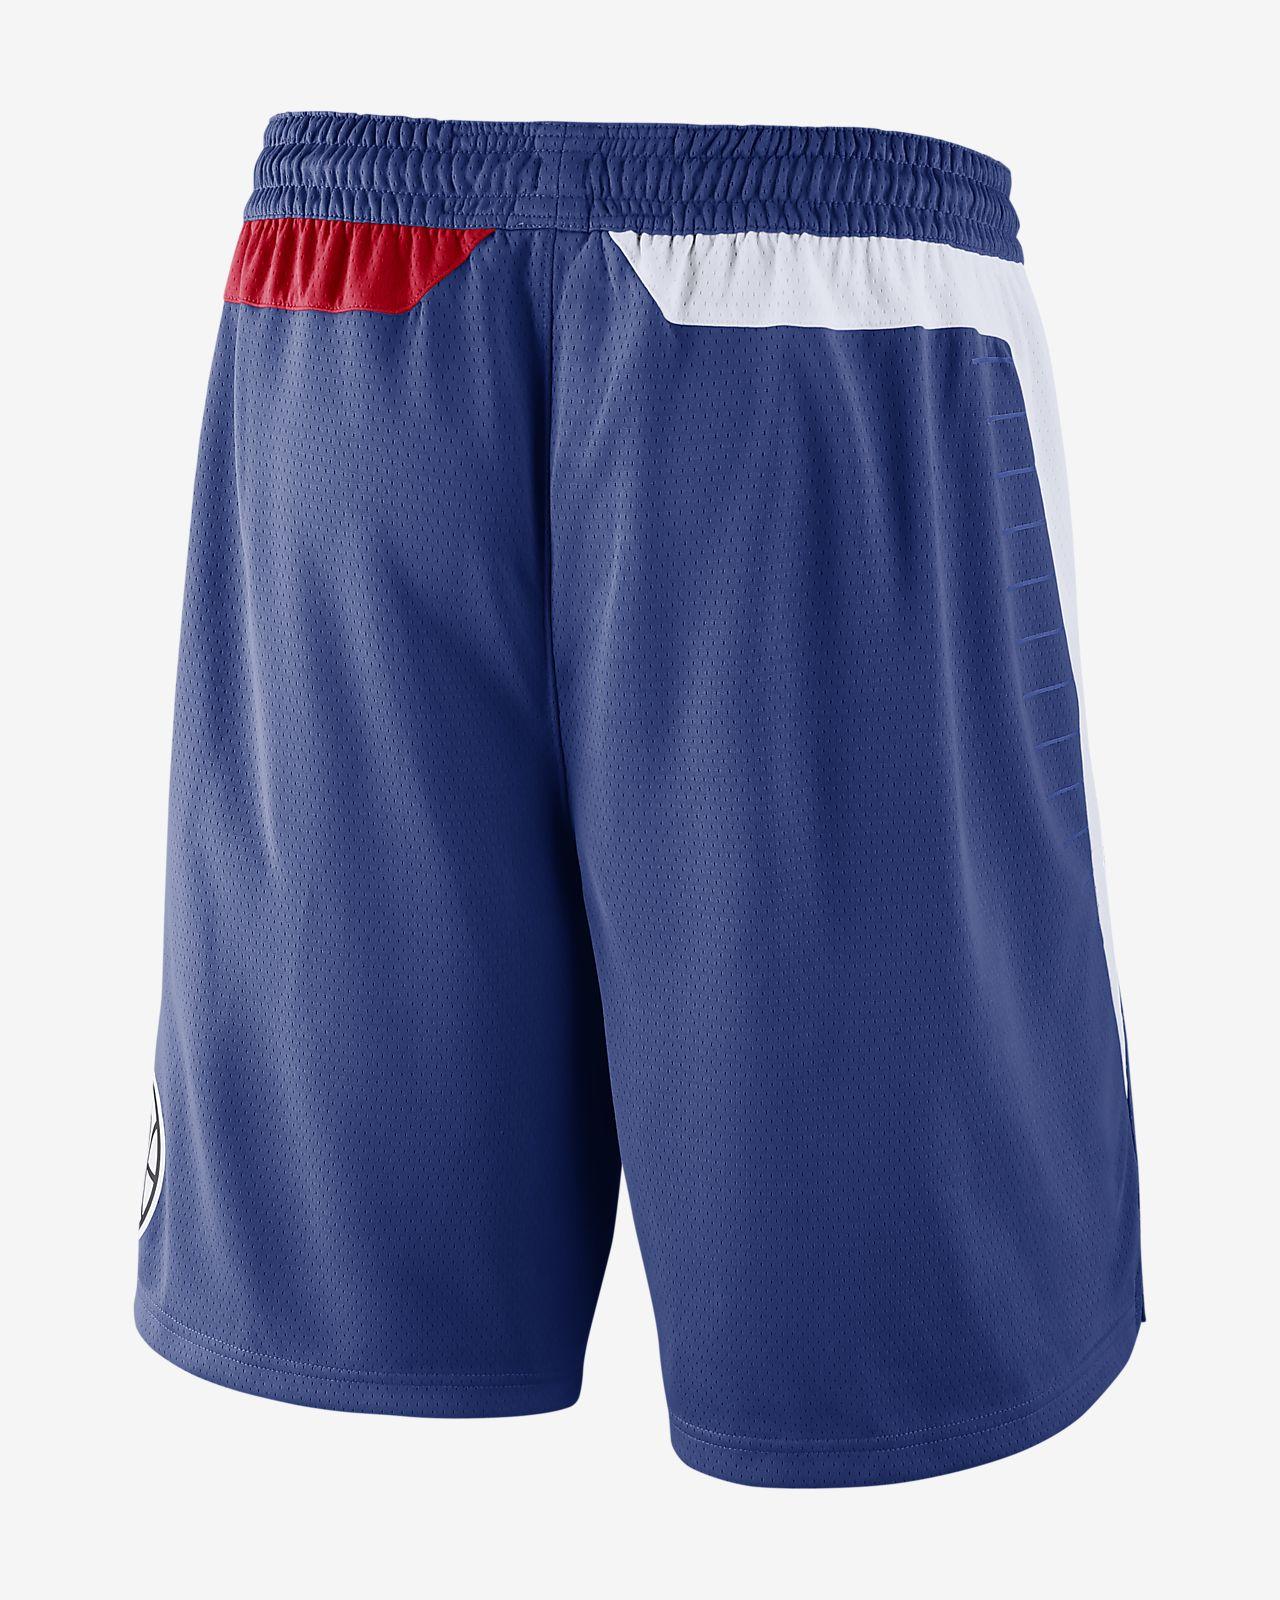 4a635559925 LA Clippers Icon Edition Swingman Men s Nike NBA Shorts. Nike.com ZA